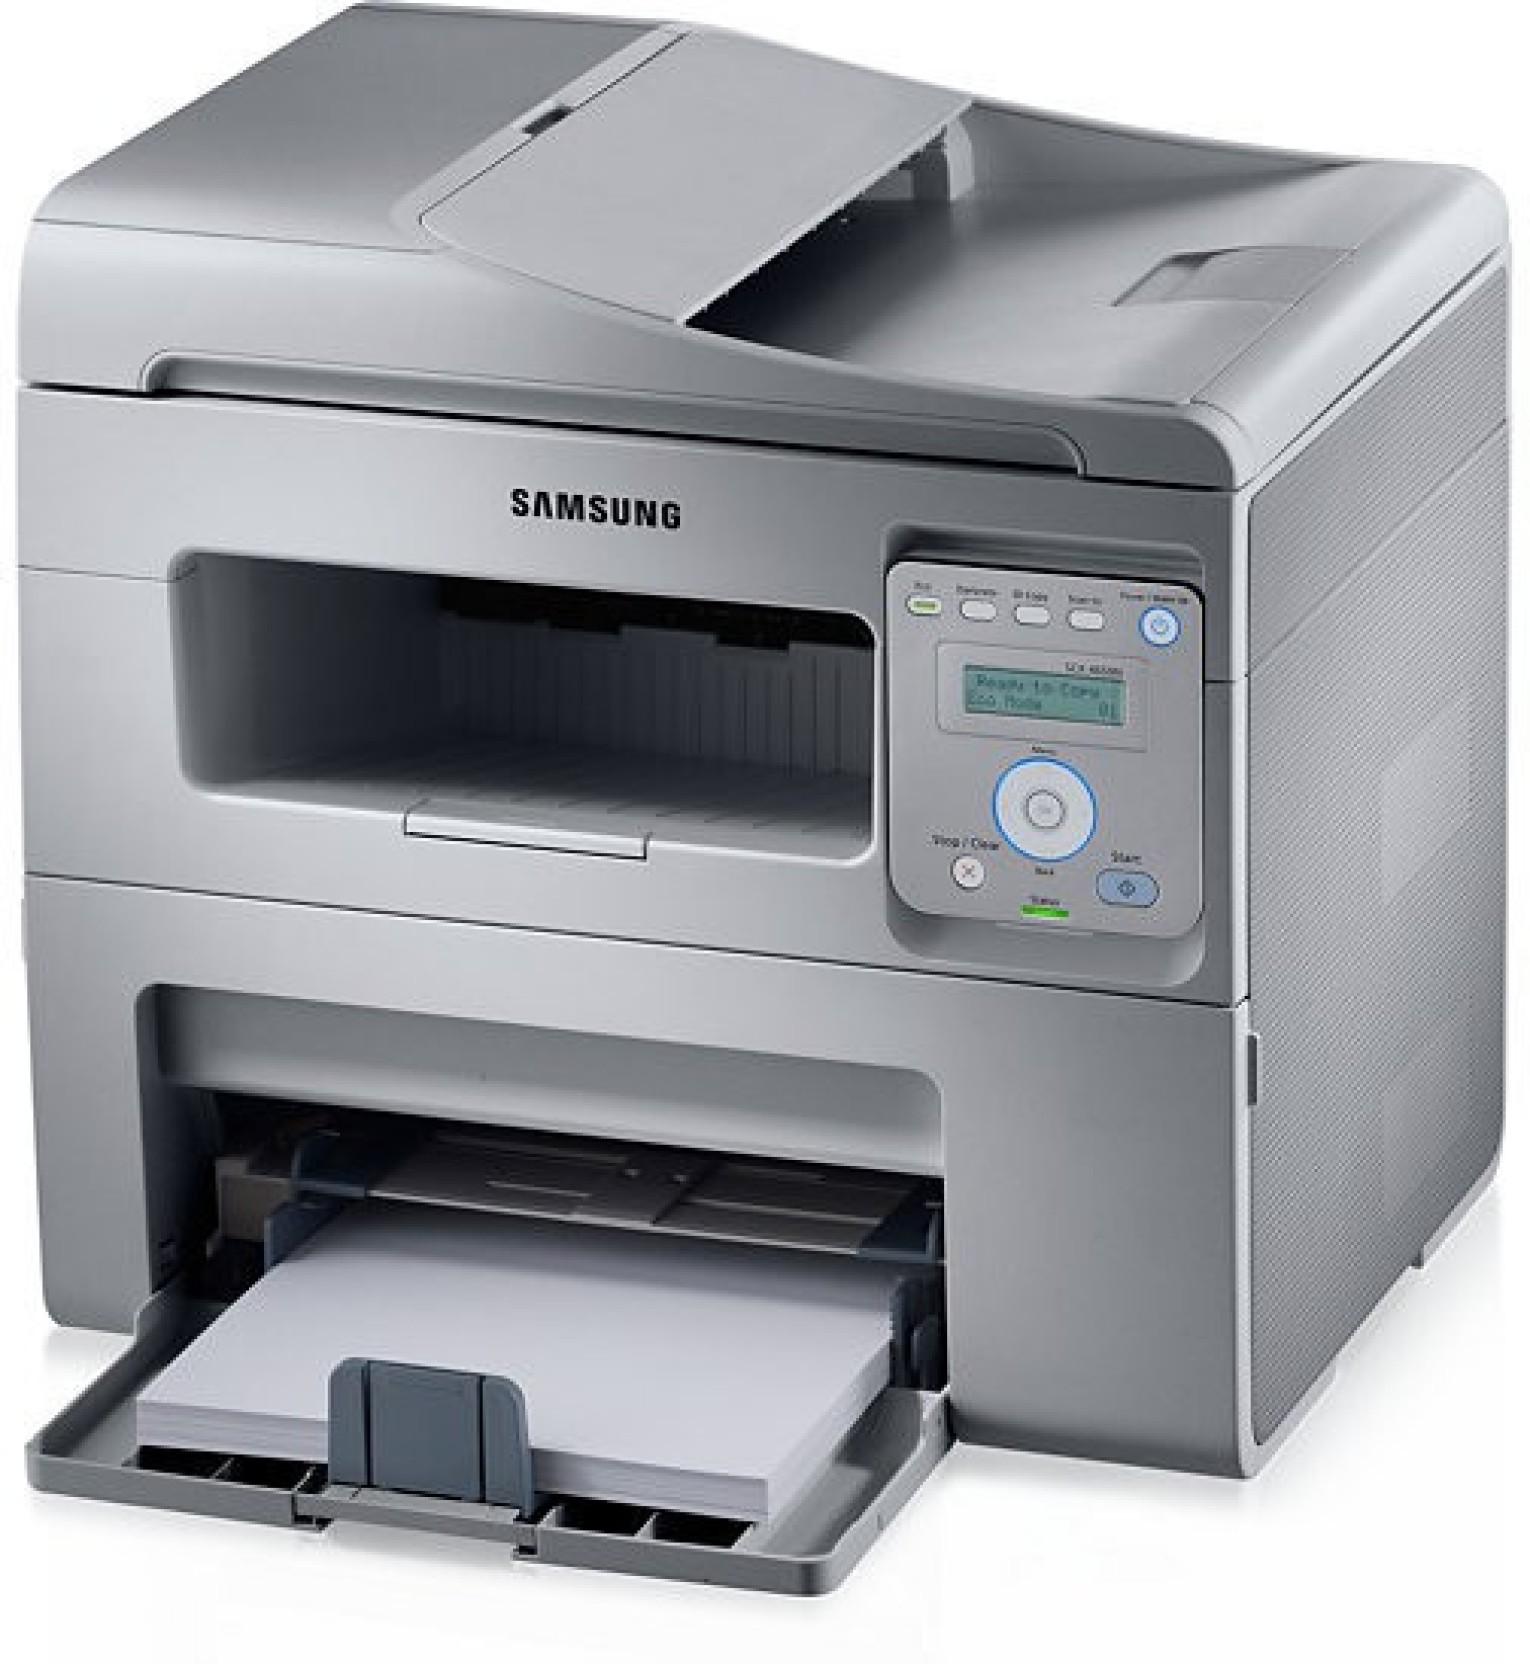 Samsung Scx 4321 All In One Laser Printer Driver Download